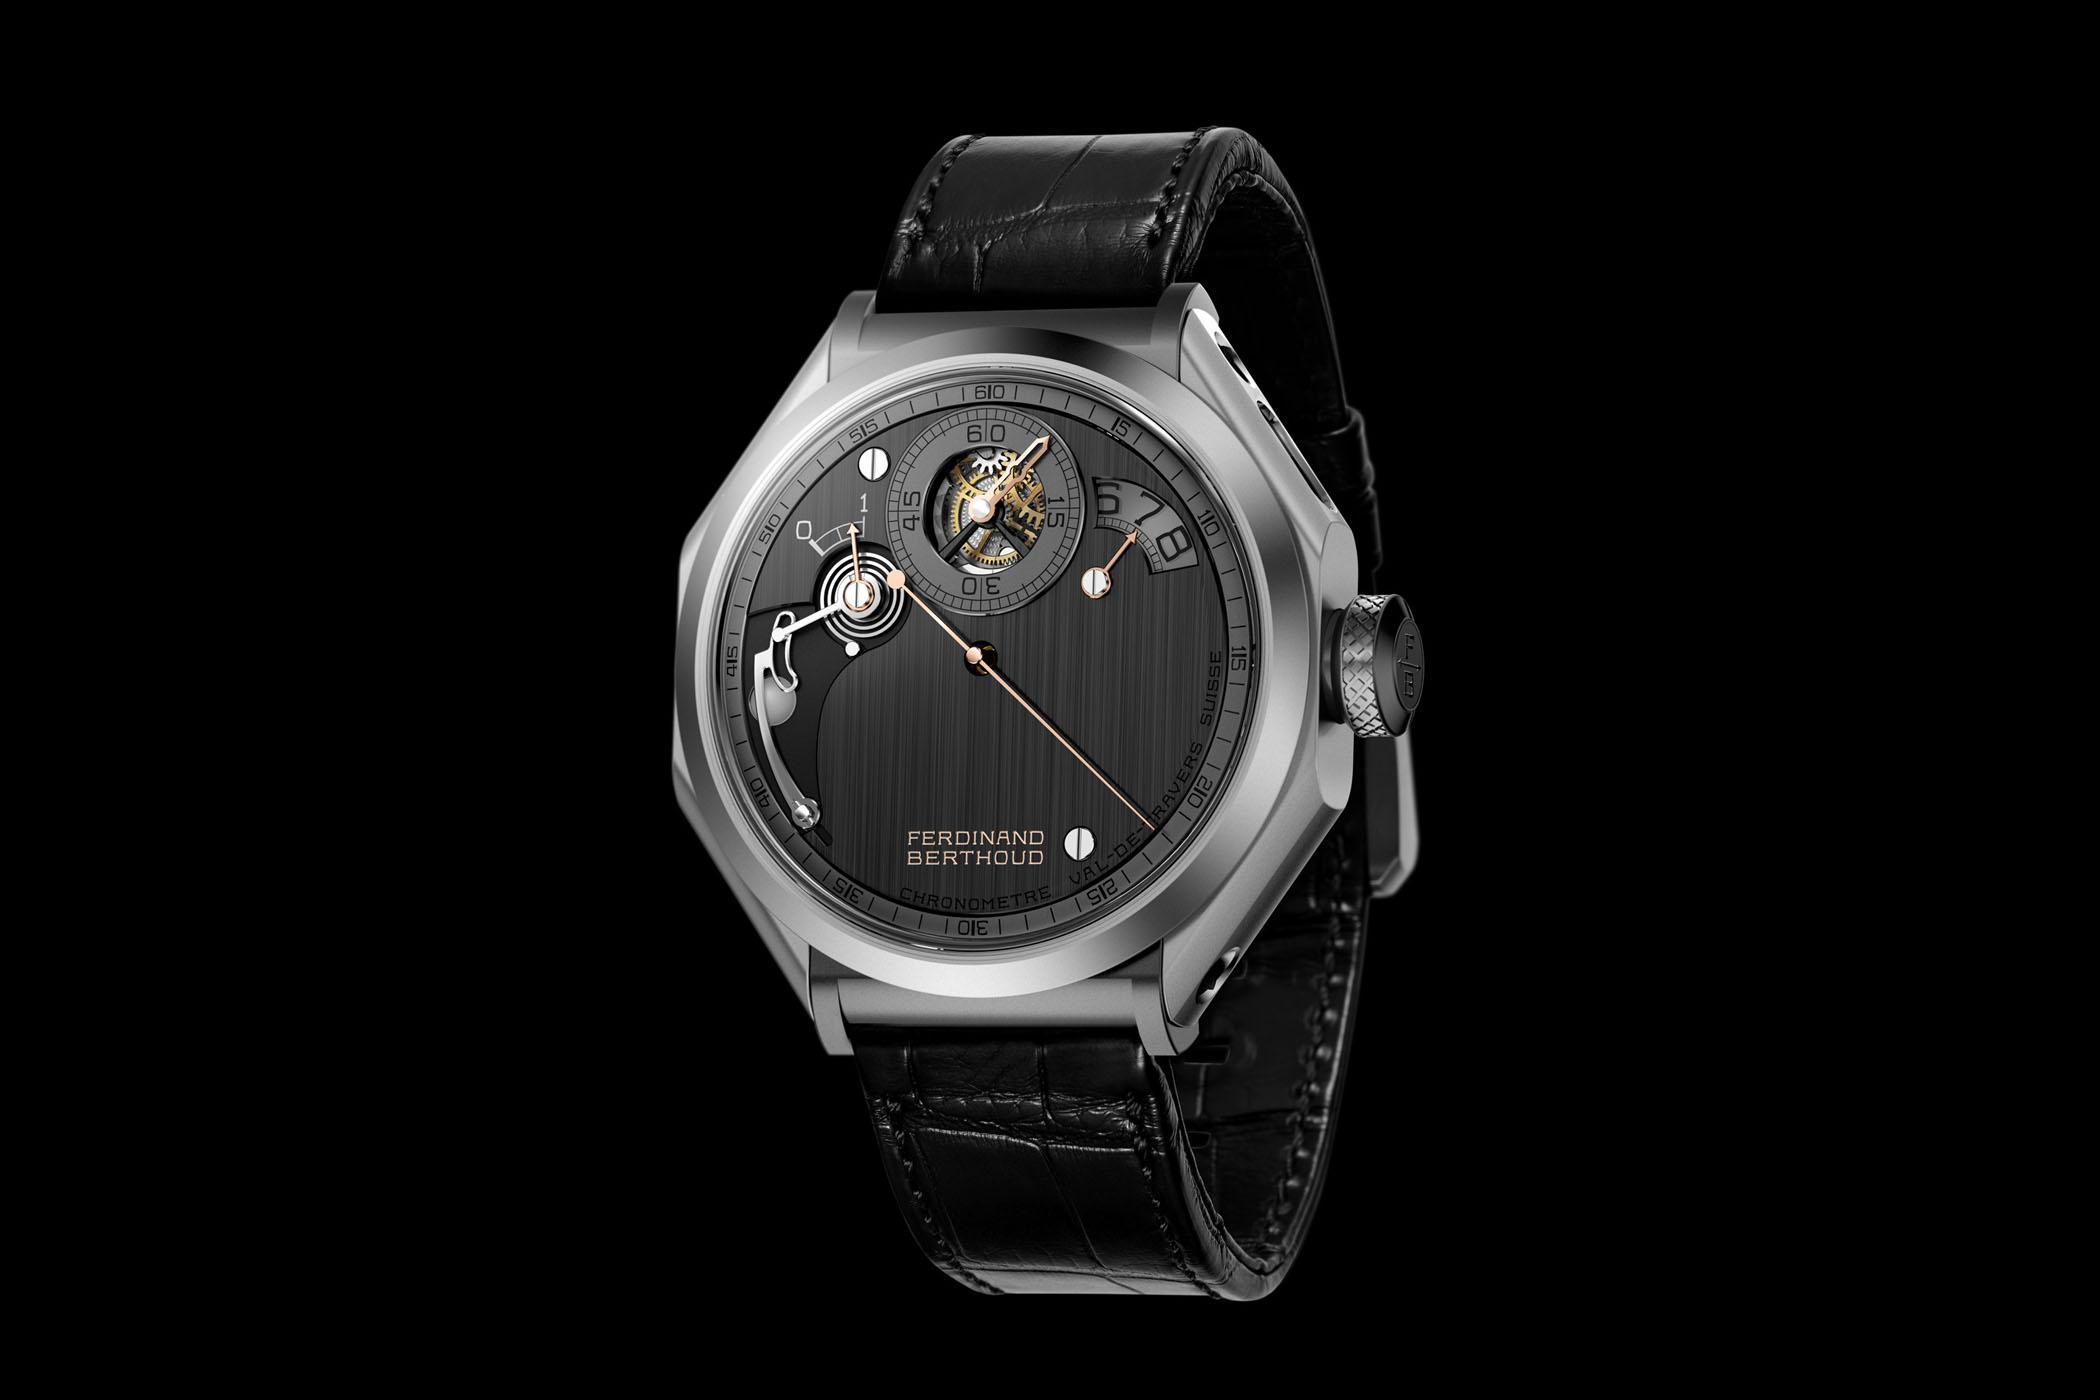 Chronometre Ferdinand Berthoud FB 1R.6-1 - SIHH 2018